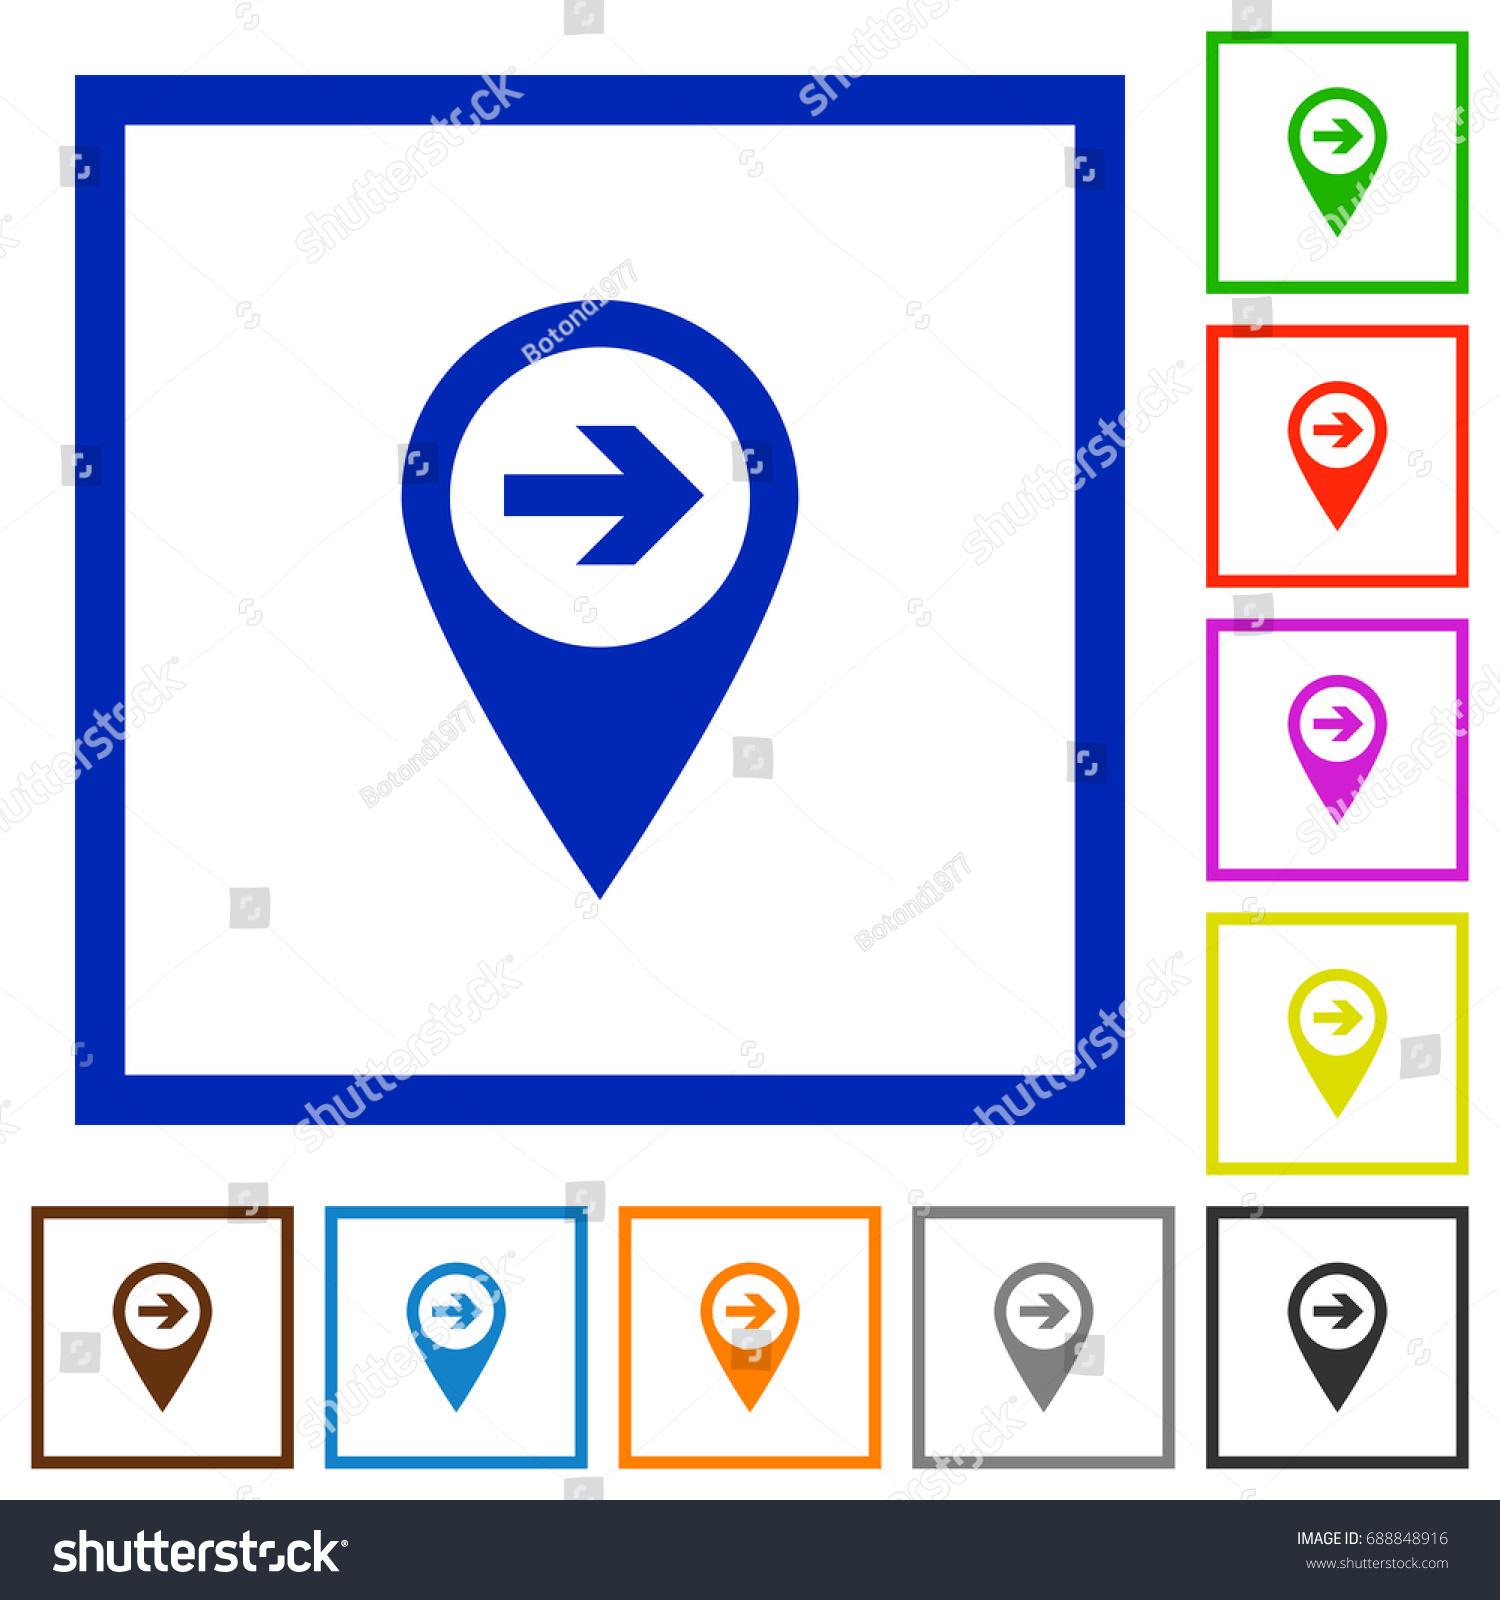 Next Target GPS Map Location Flat Stock Vector 688848916 - Shutterstock